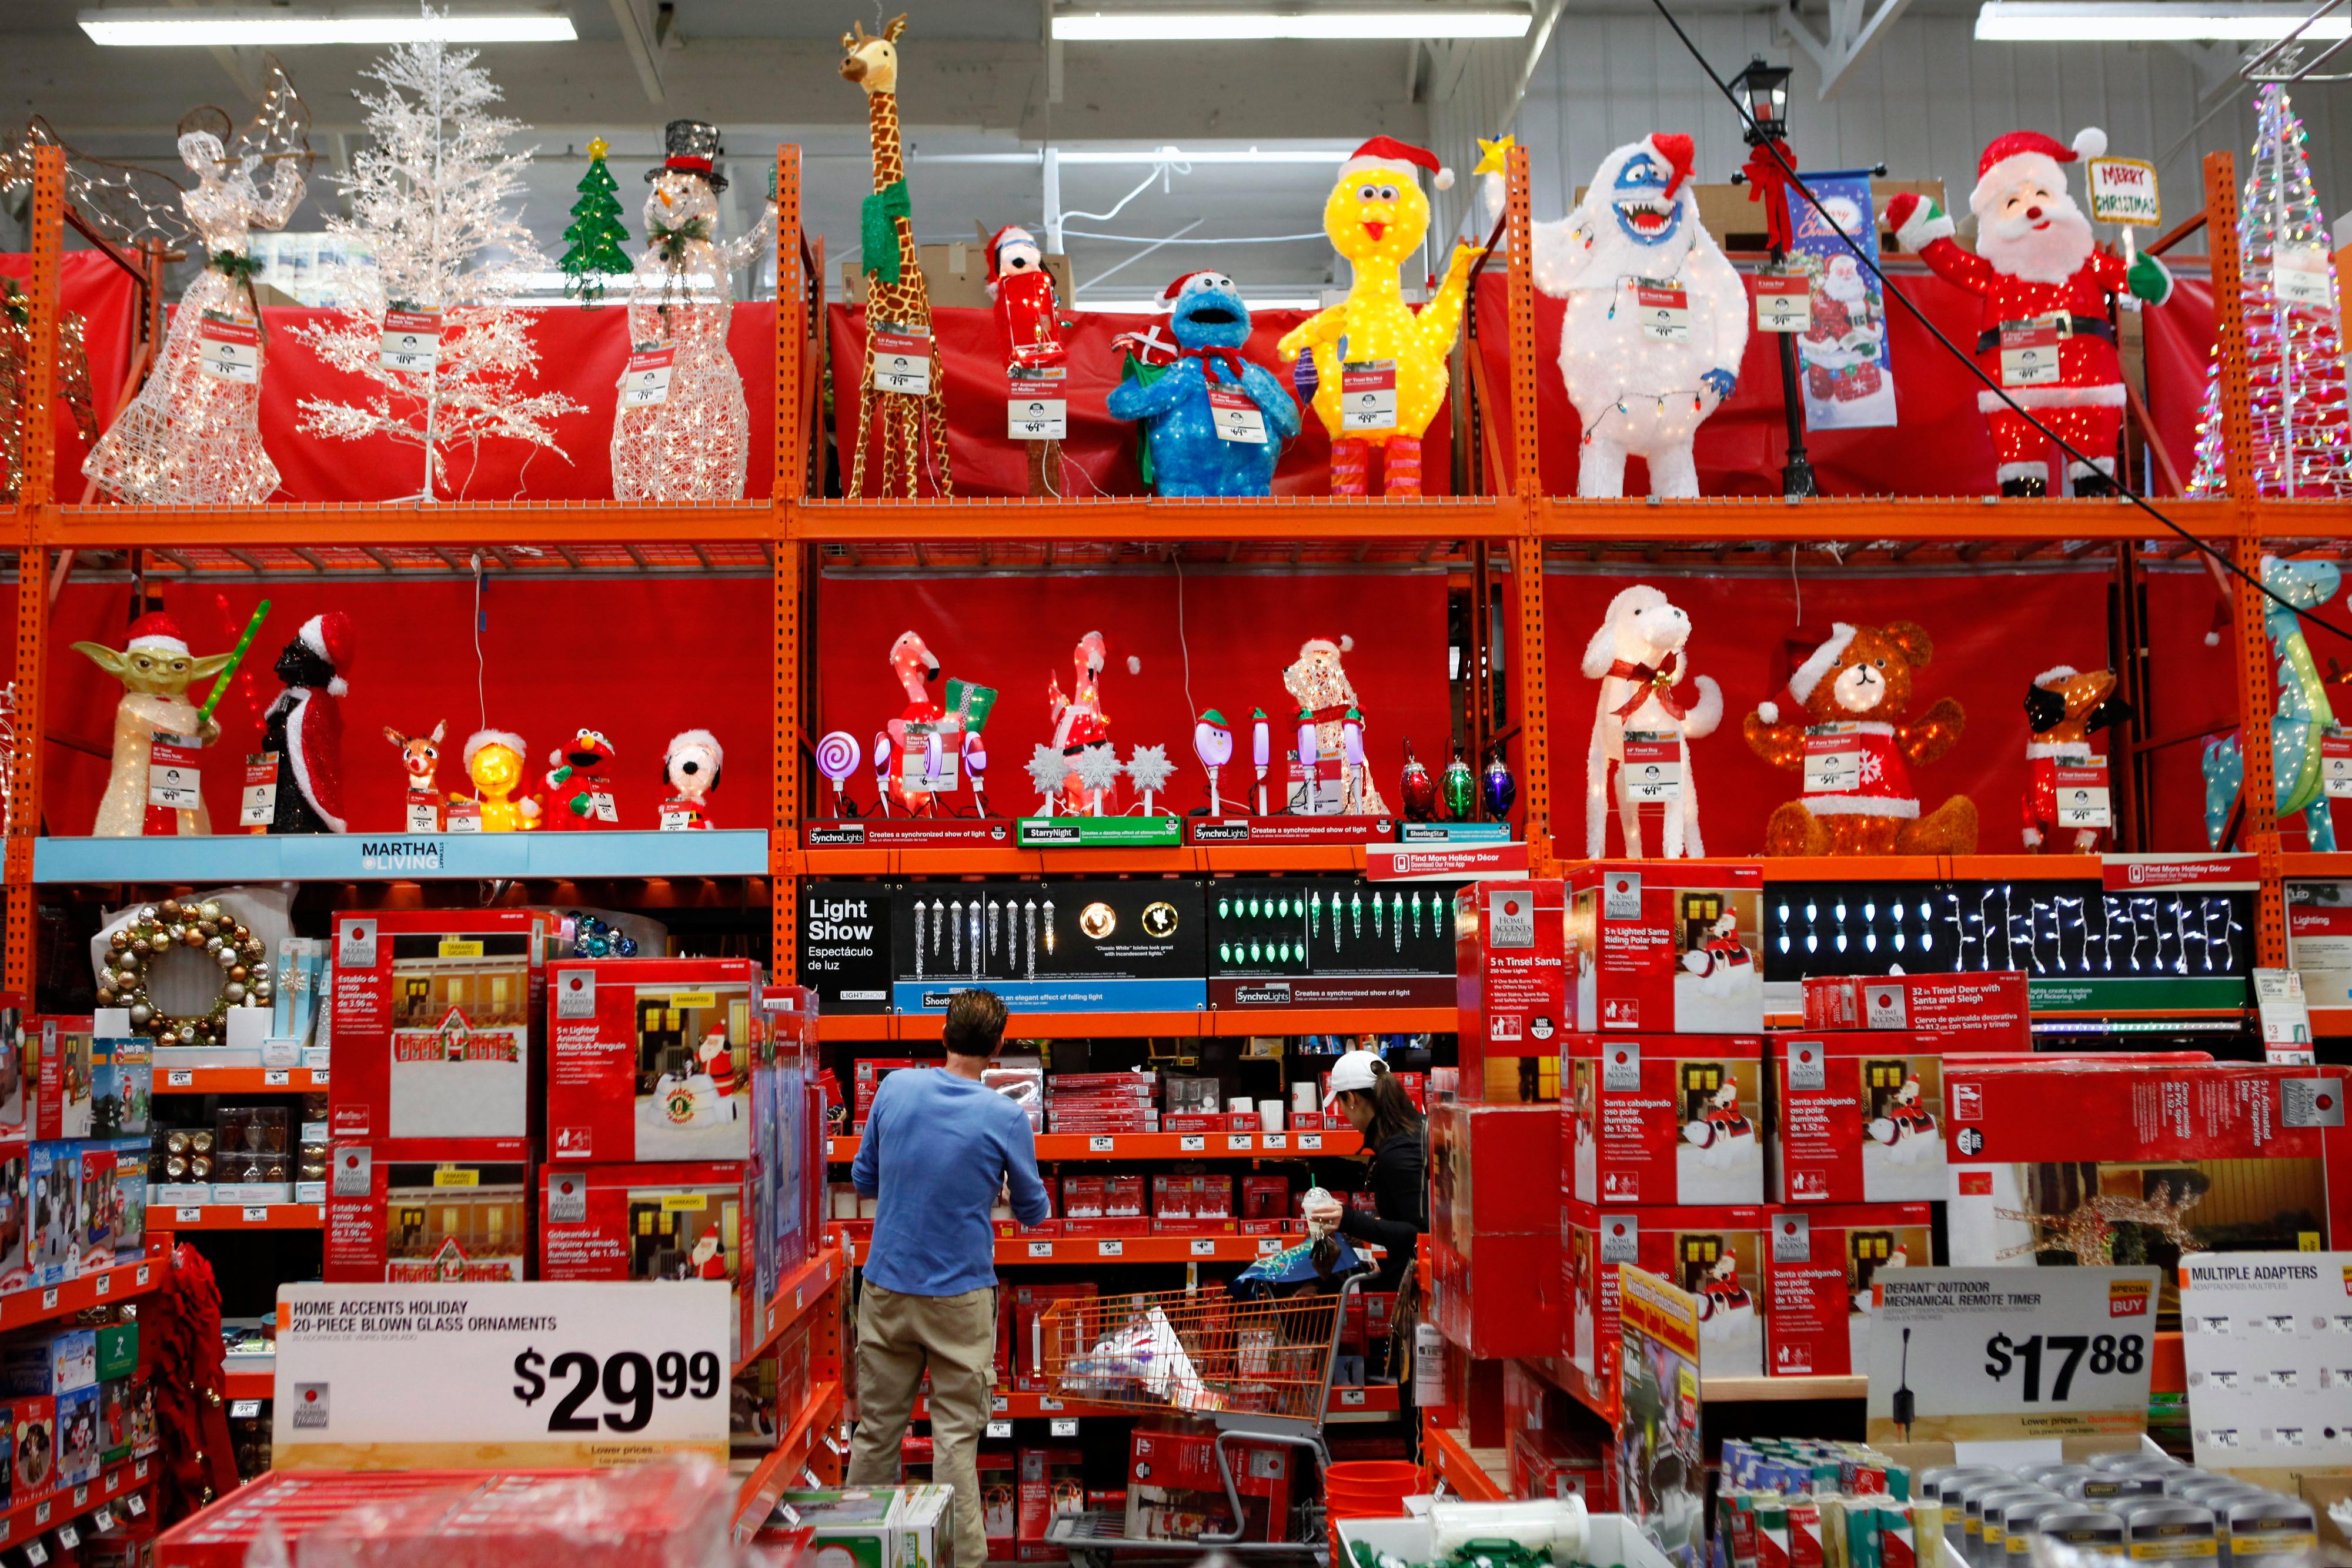 Post Christmas Decorations Deals at Home Depot, Walmart, Target ...